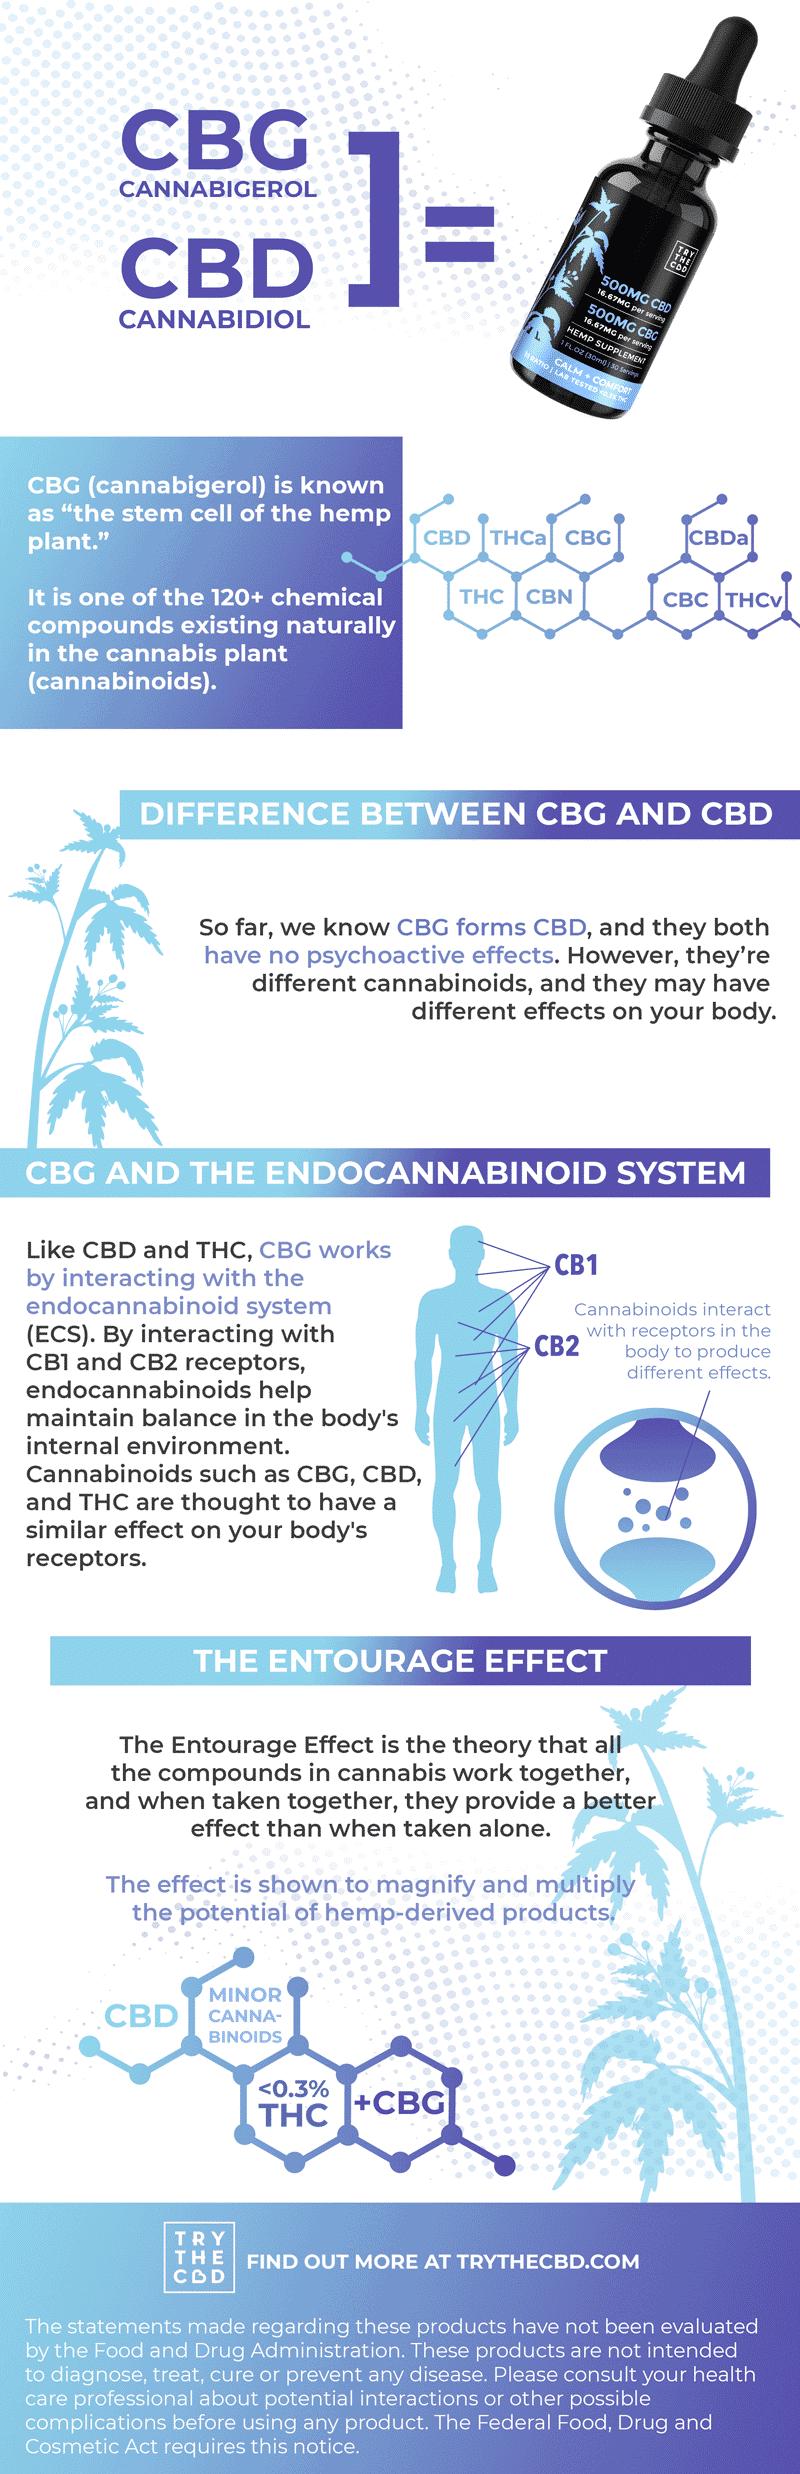 CBG + CBD Oil Infographic